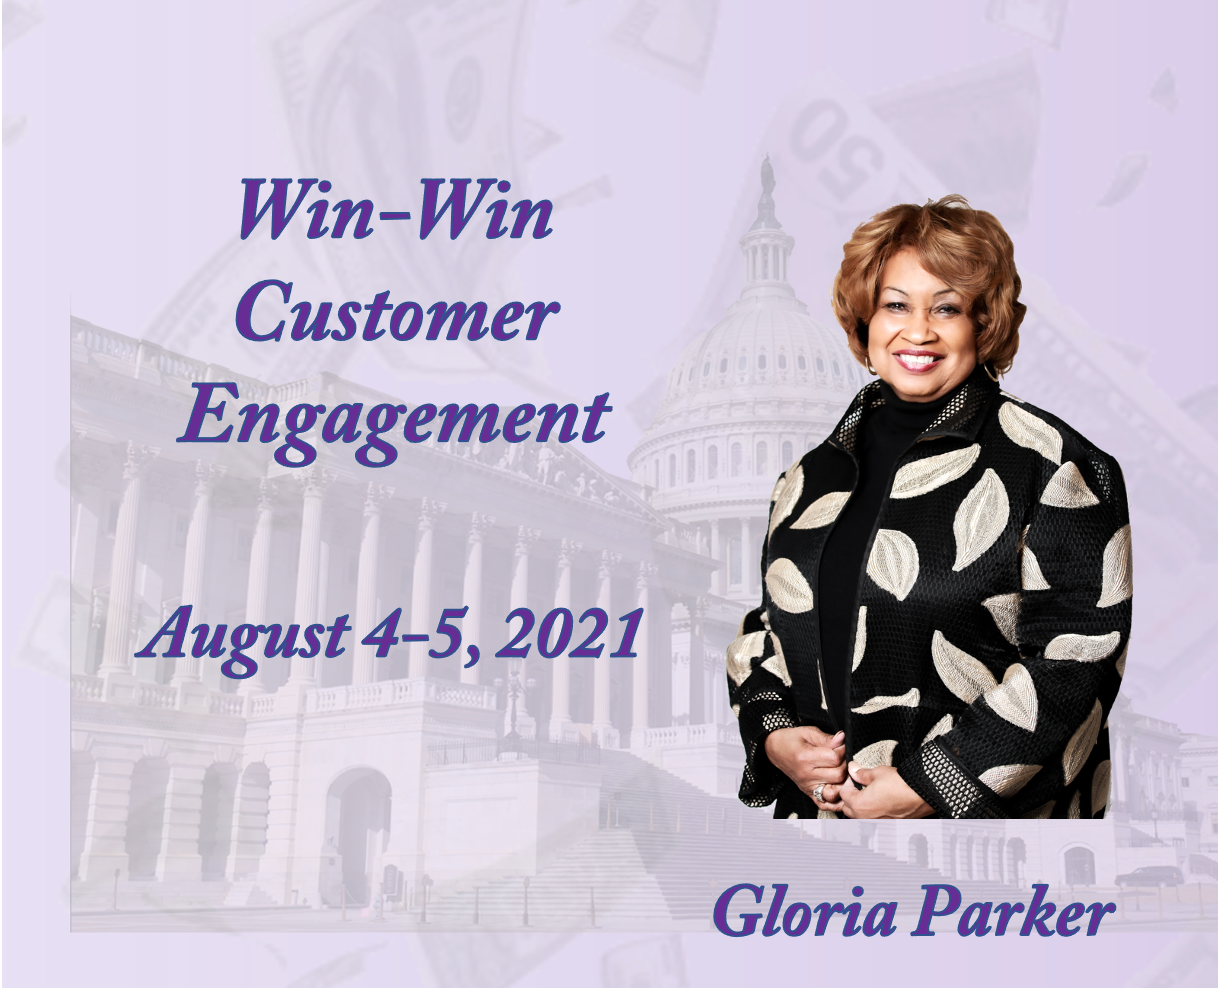 Win-Win Customer Engagement